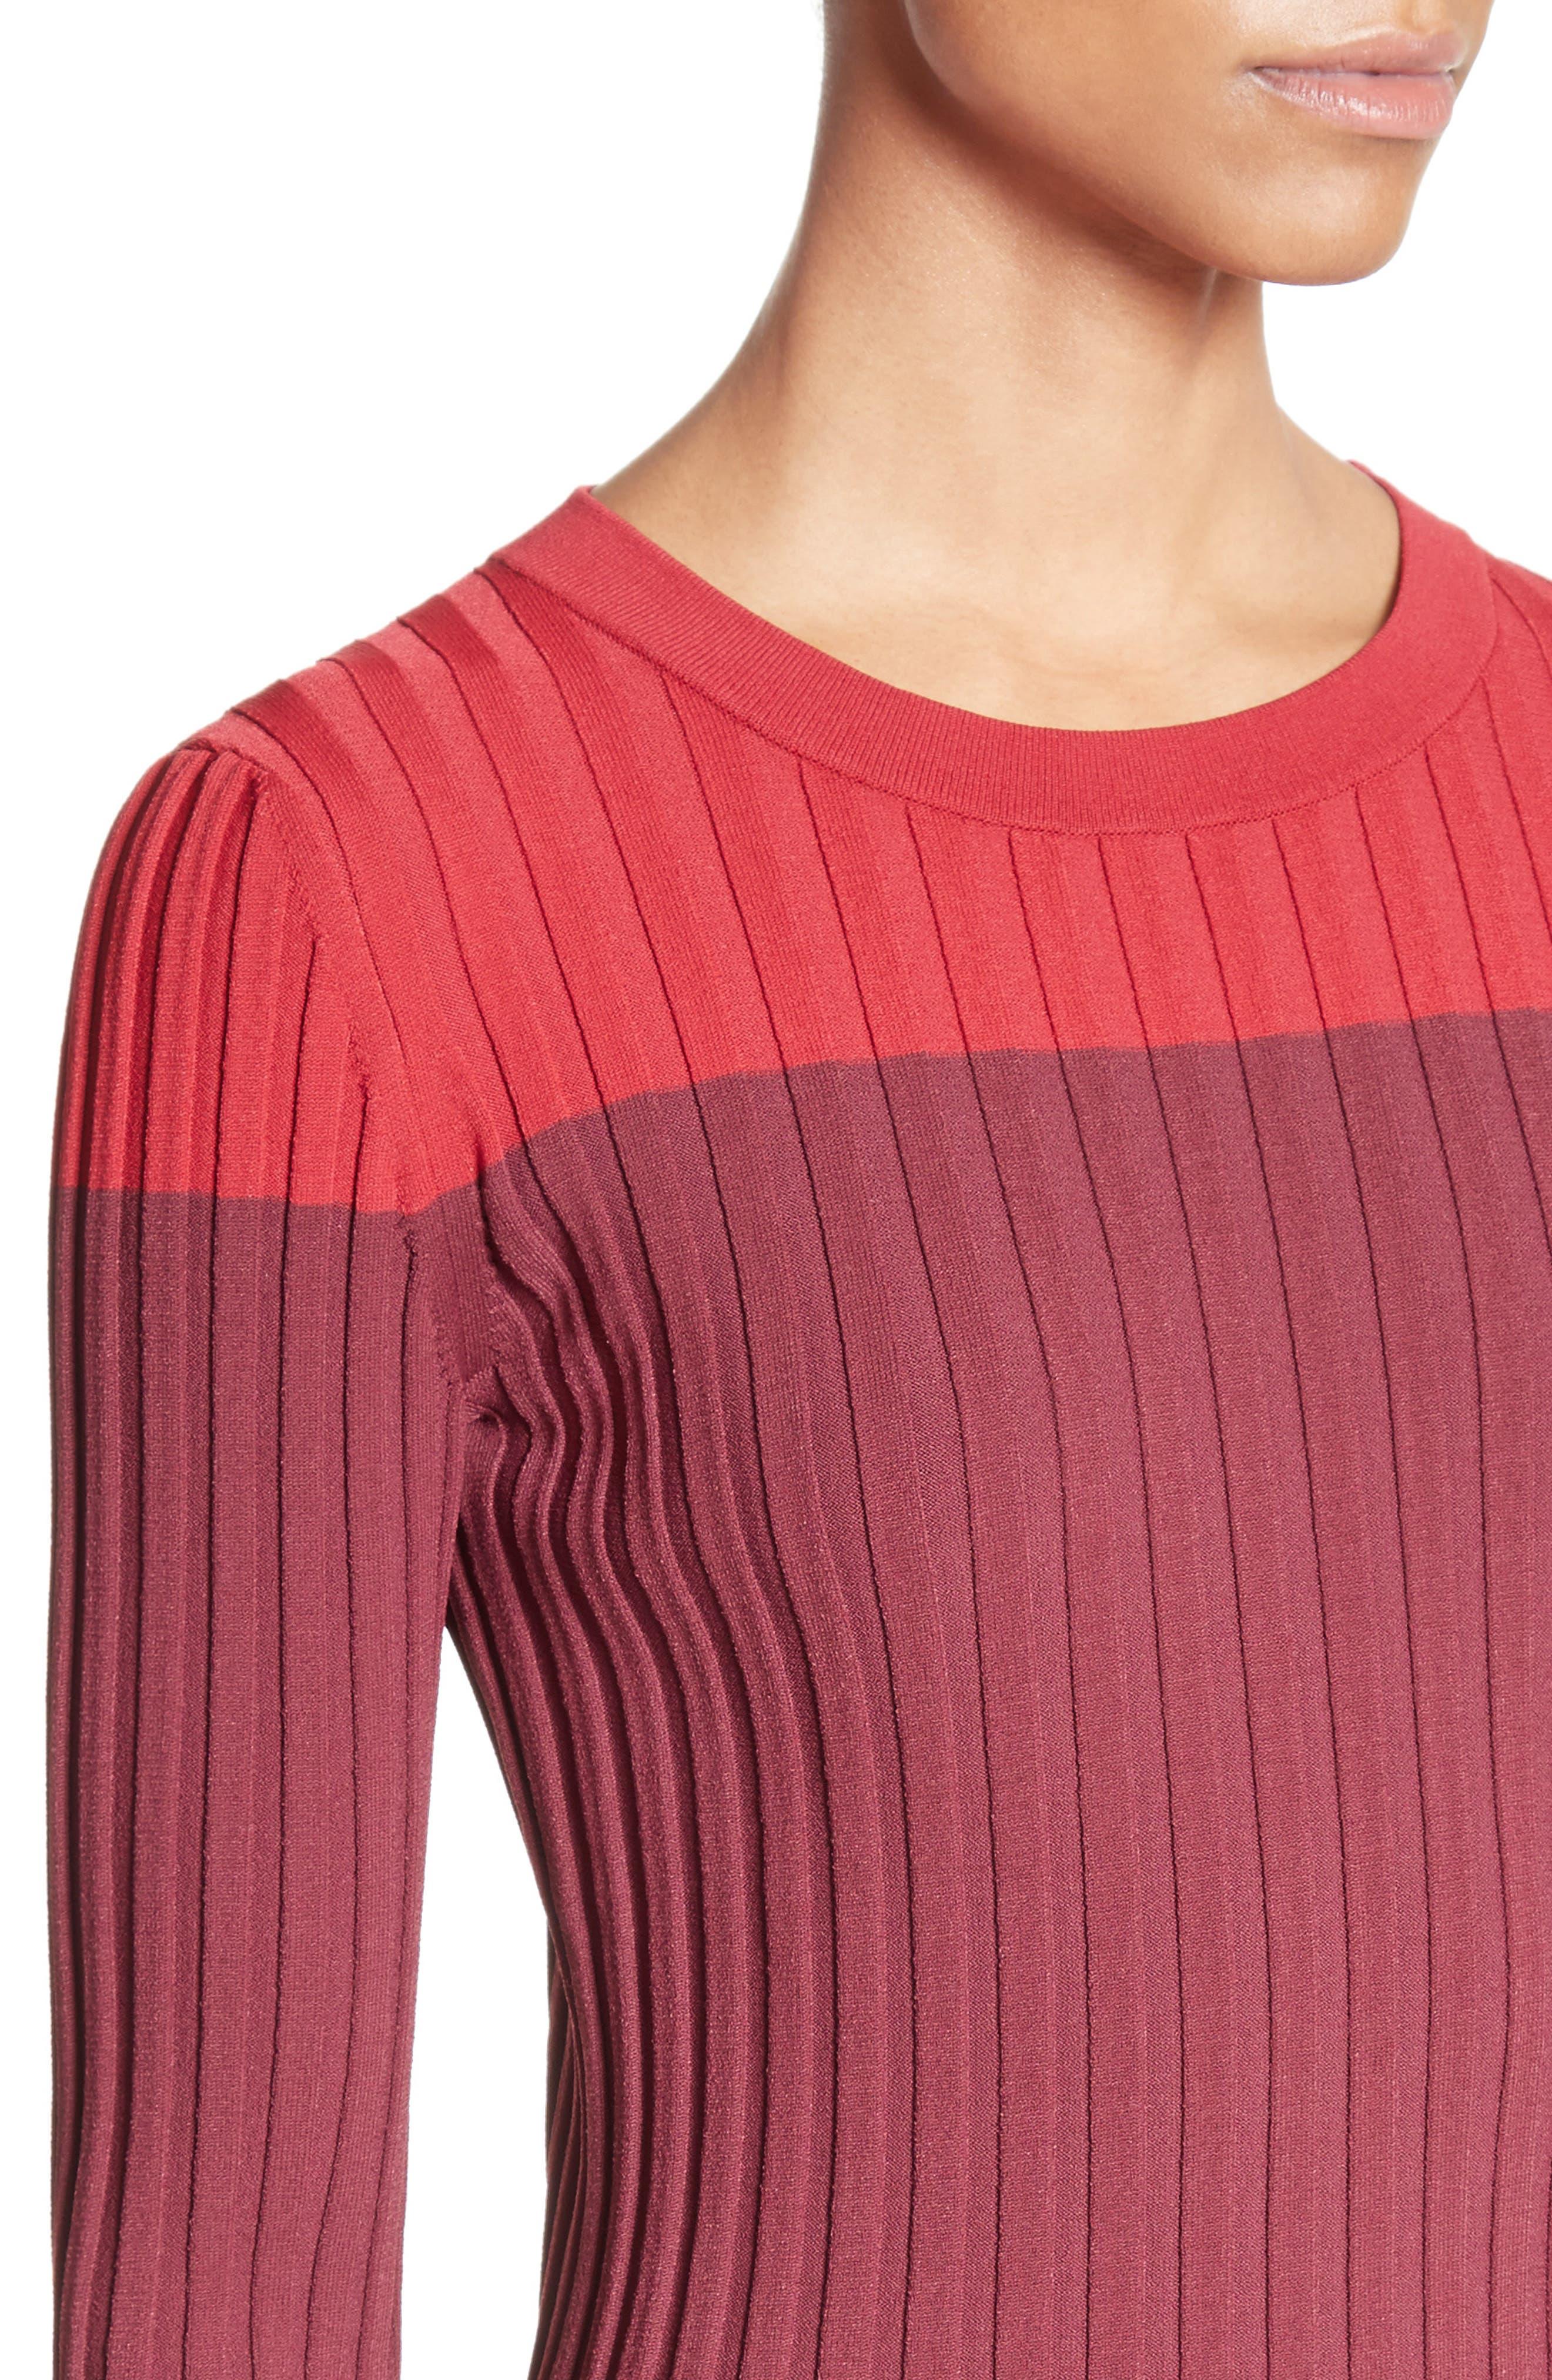 Leila Colorblock Knit Sweater,                             Alternate thumbnail 6, color,                             Port Multi